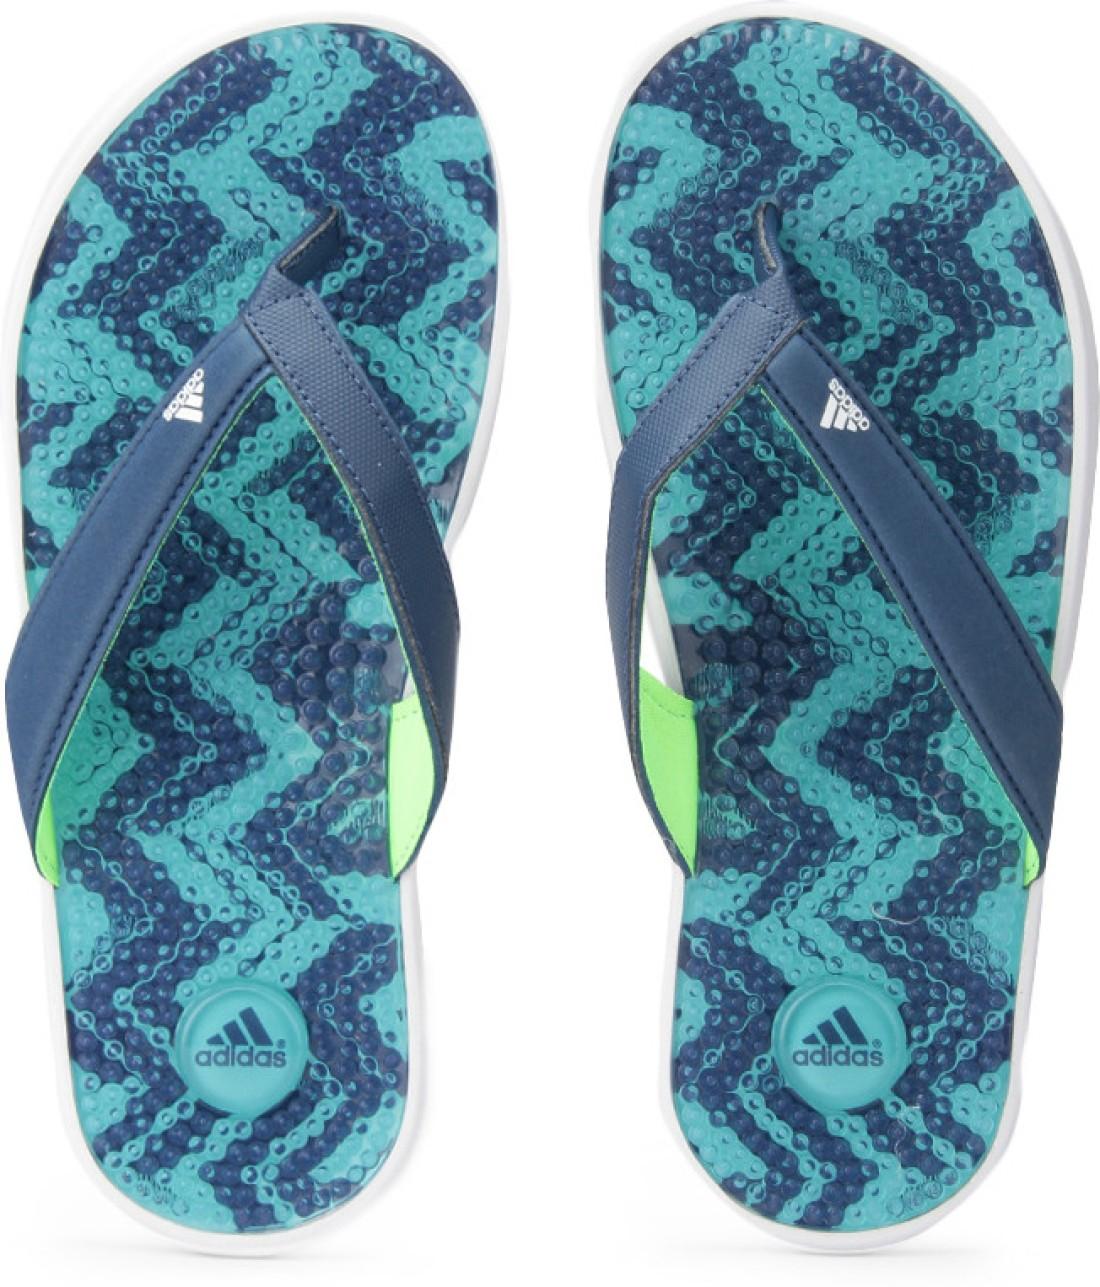 adidas Adissage Thong Gr W Flip Flops